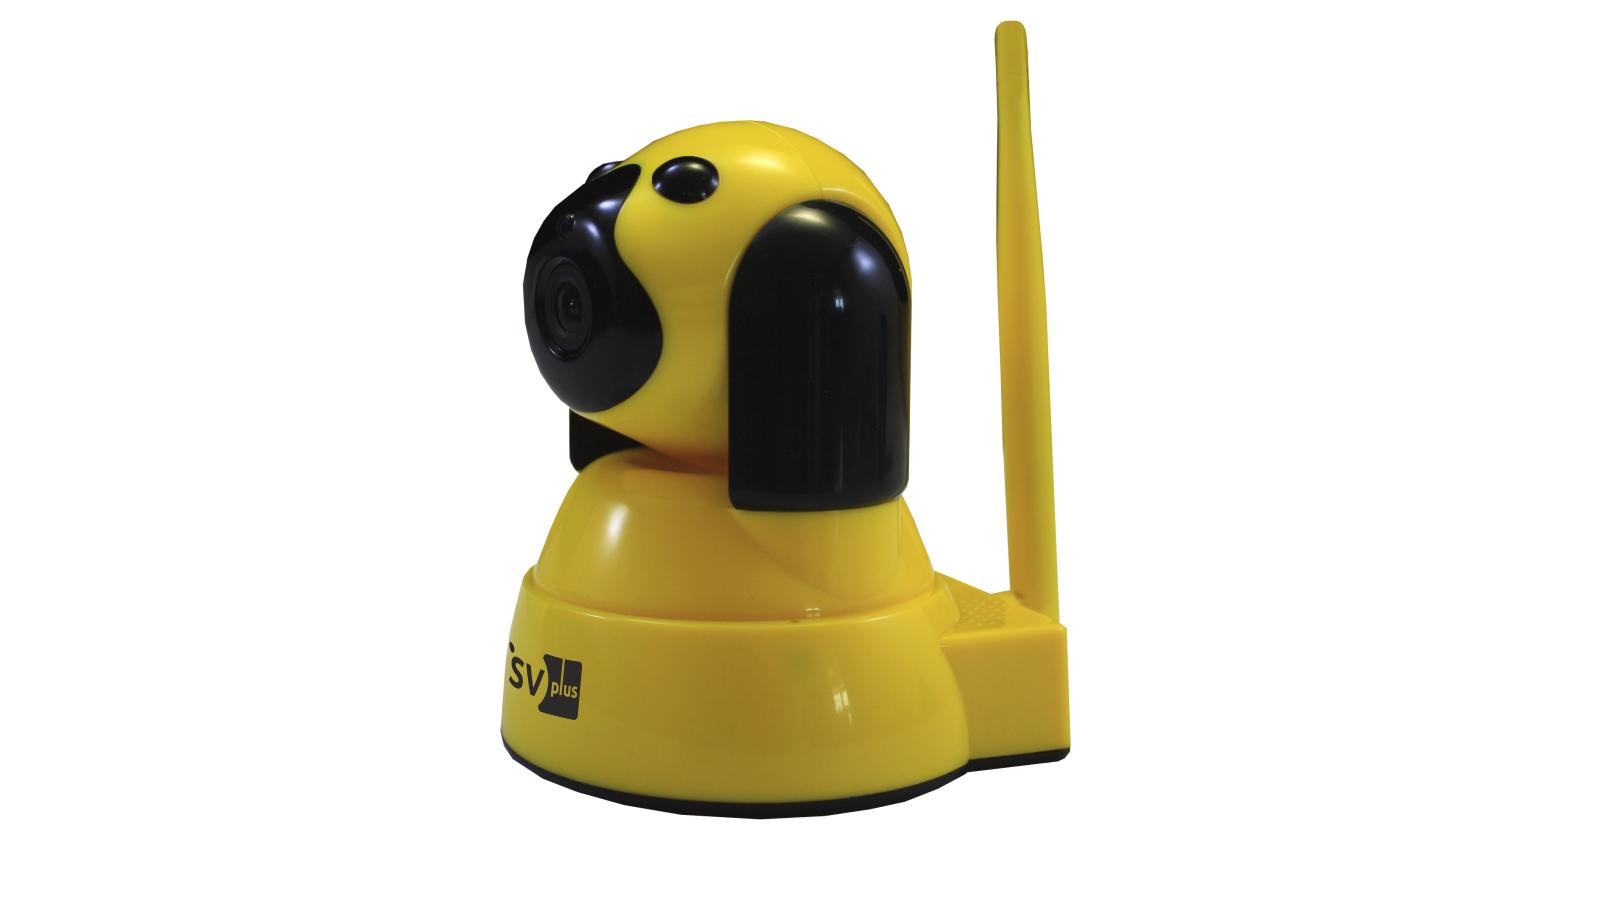 Камера видеонаблюдения Svplus Svip-pt300_dog